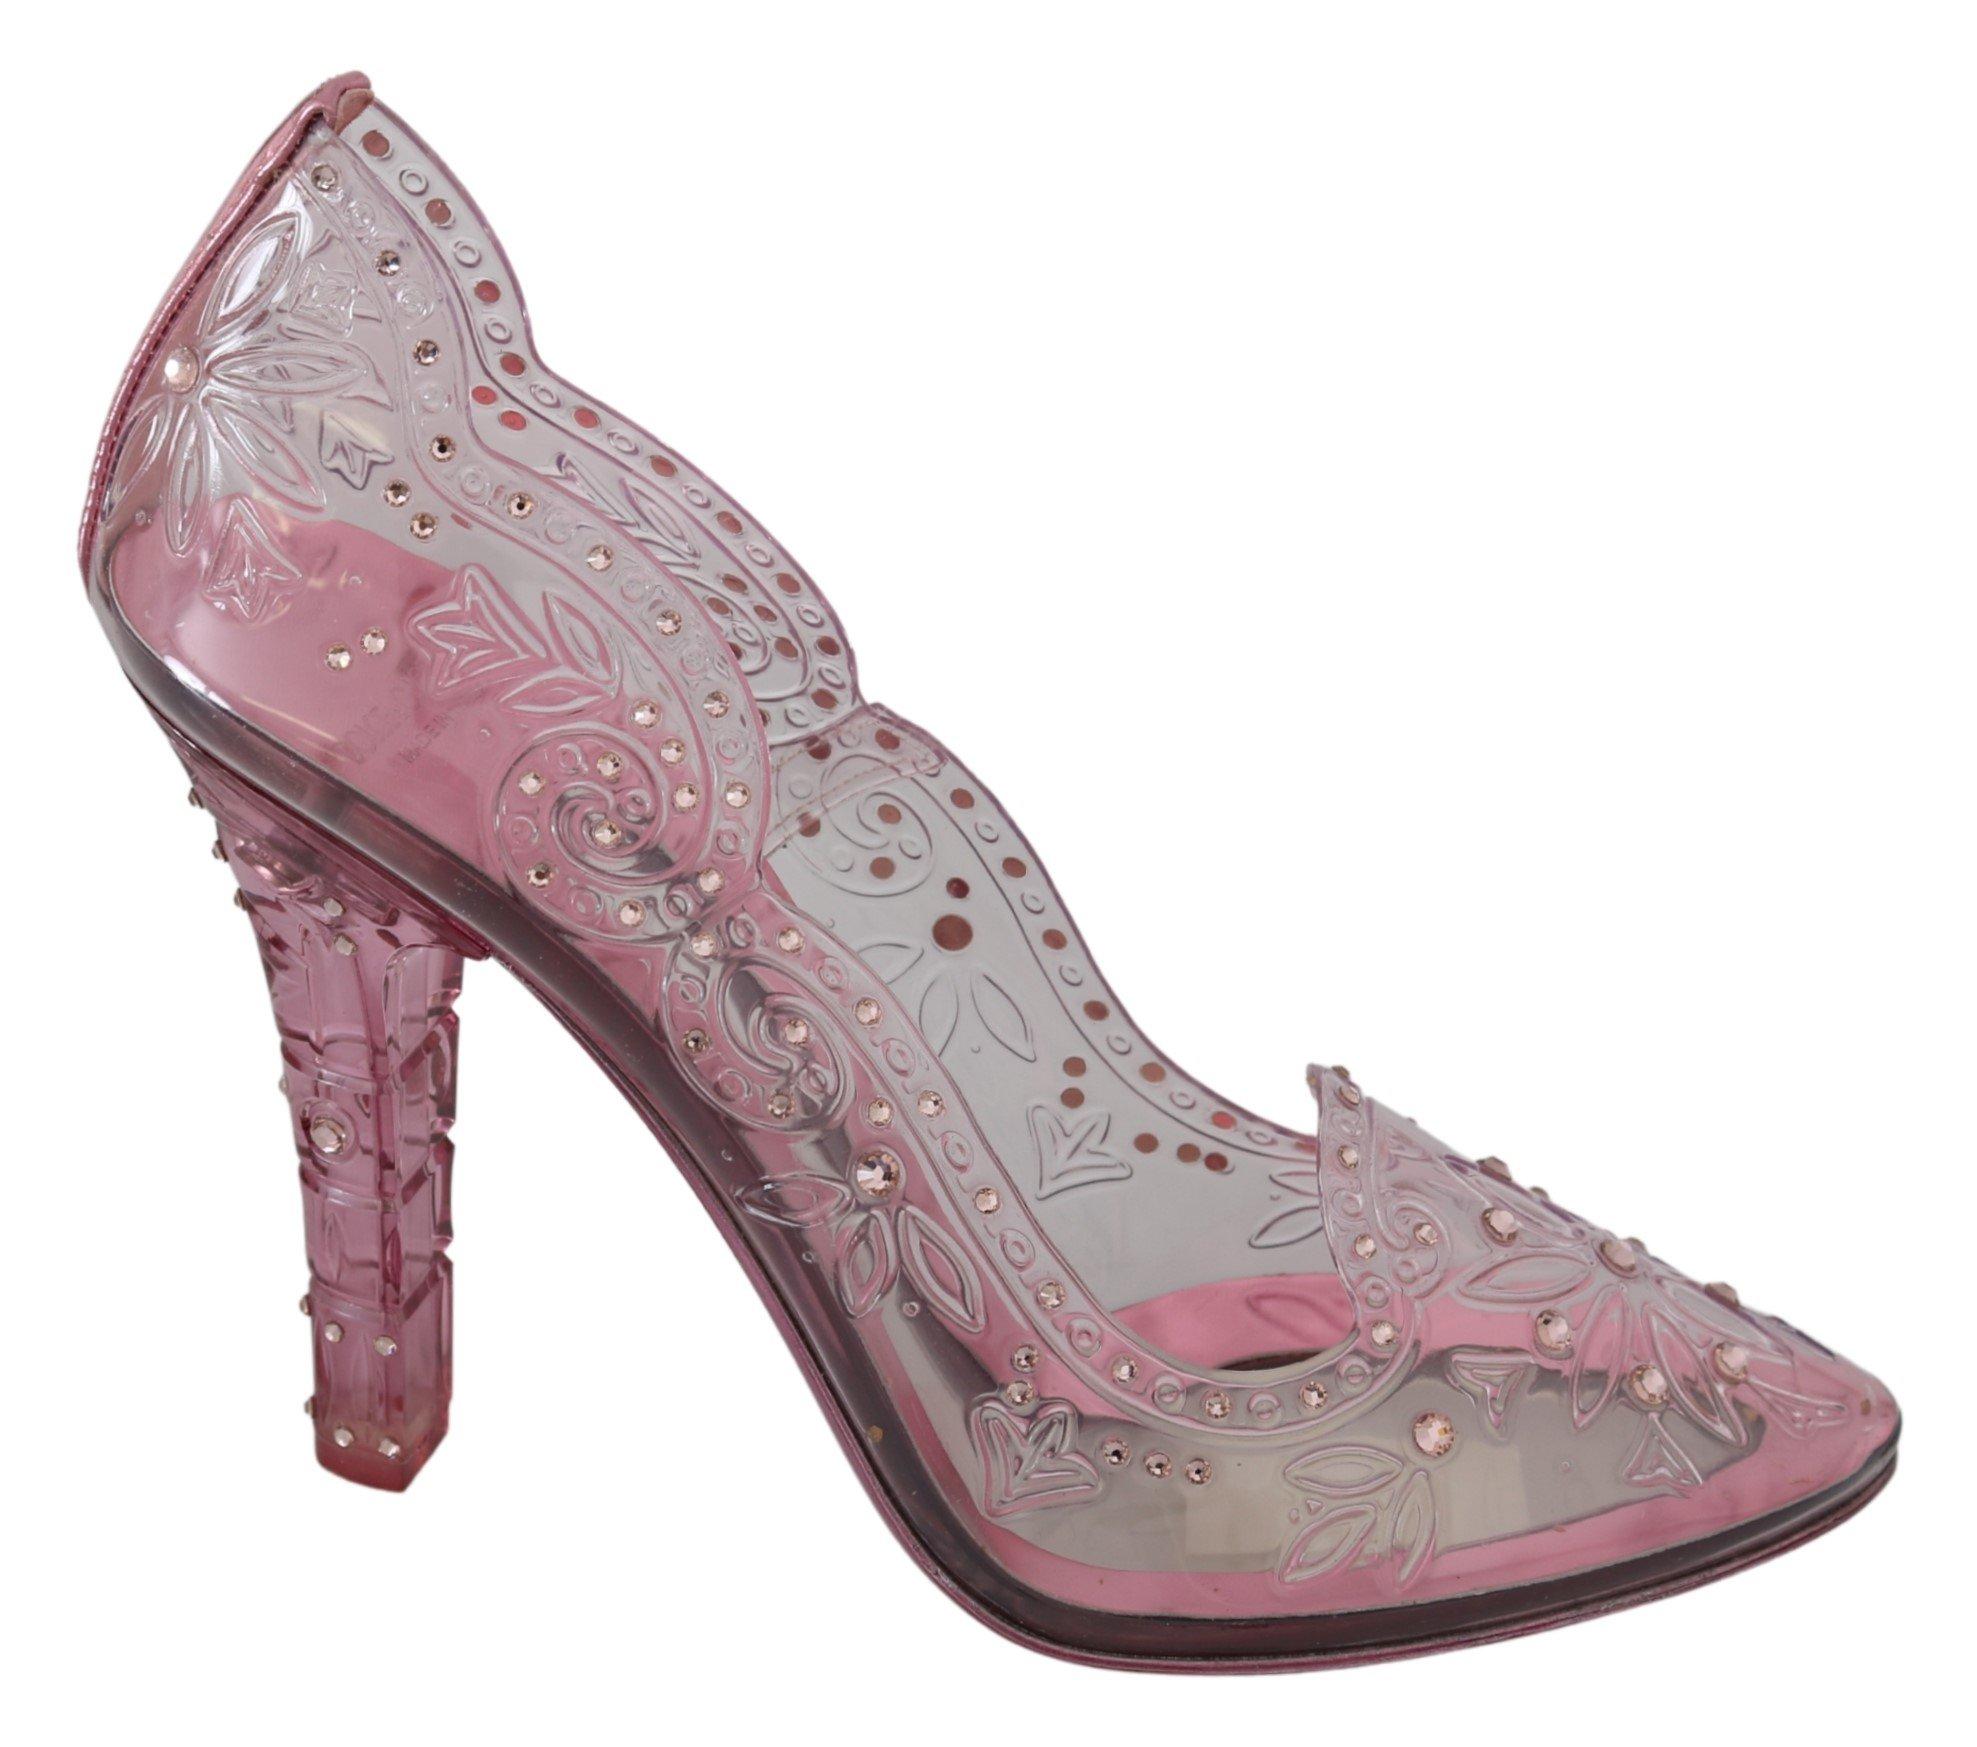 Dolce & Gabbana Women's Crystal Floral CINDERELLA Pumps Pink LA7277 - EU40/US9.5